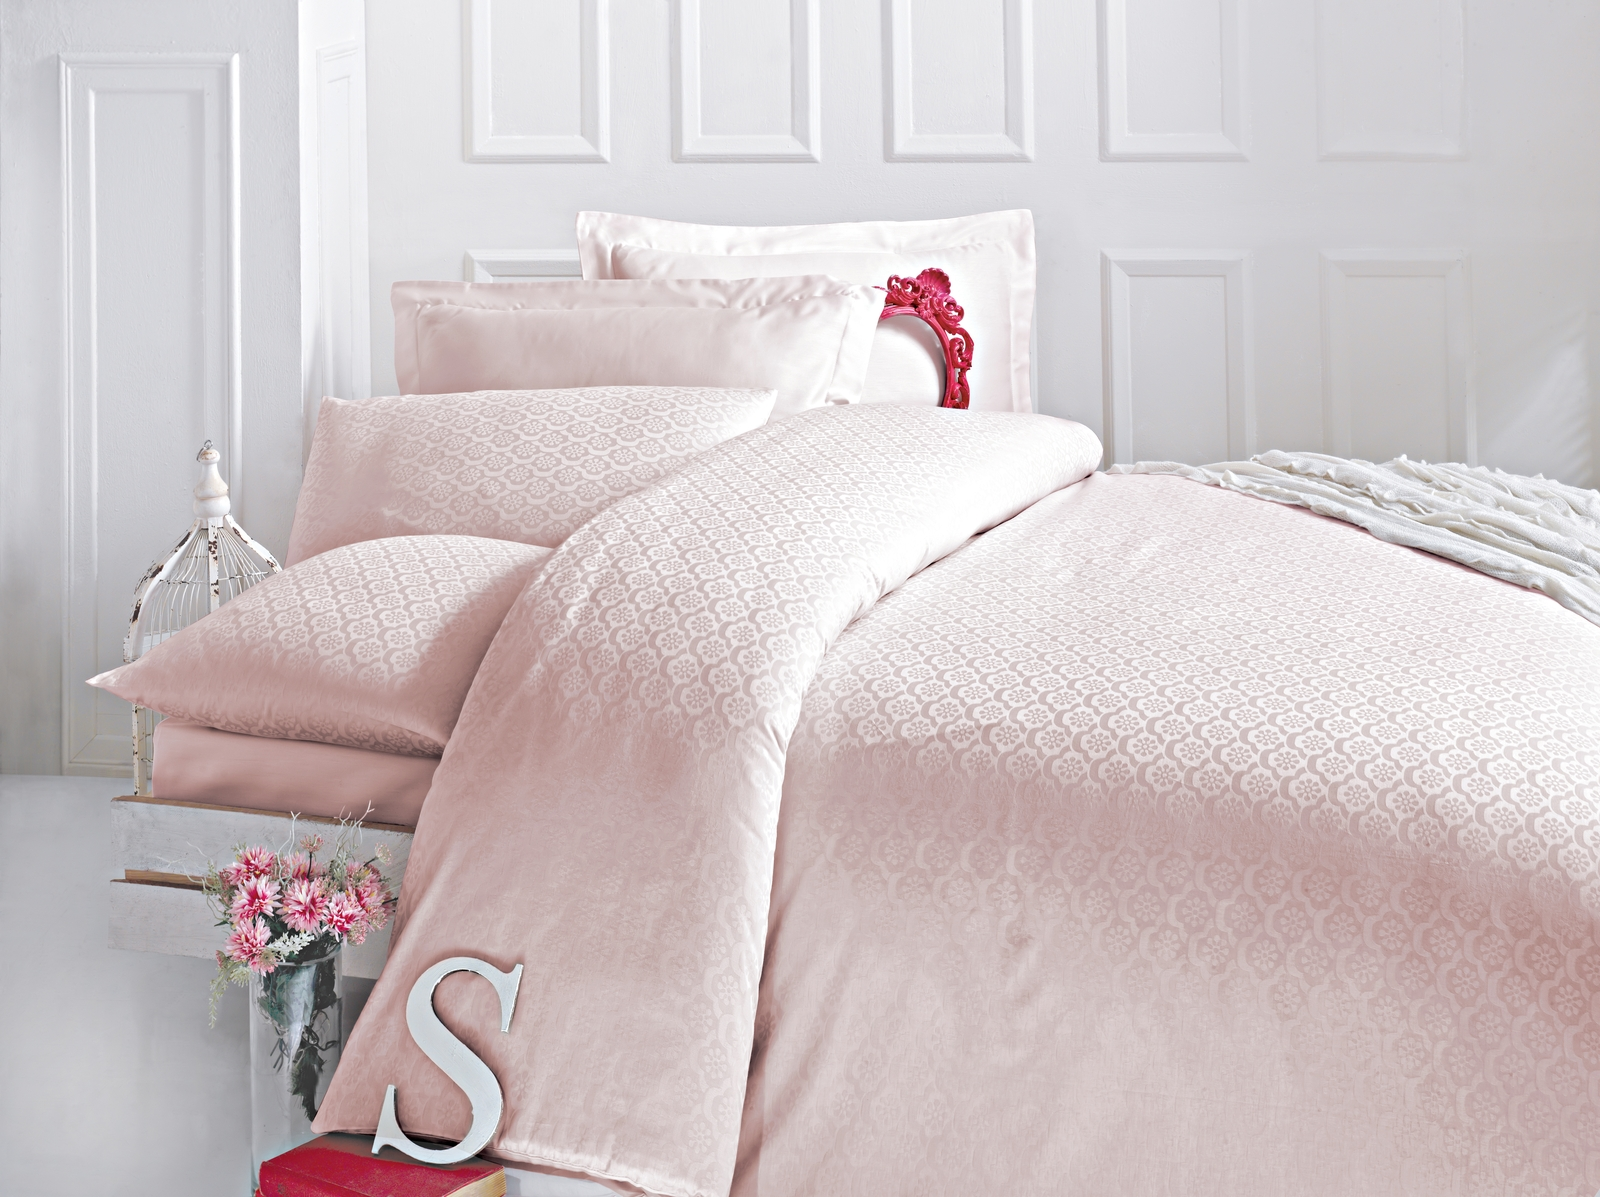 цена на Комплект белья Issimo Home Monte, евро, наволочки 50x70, цвет: розовый